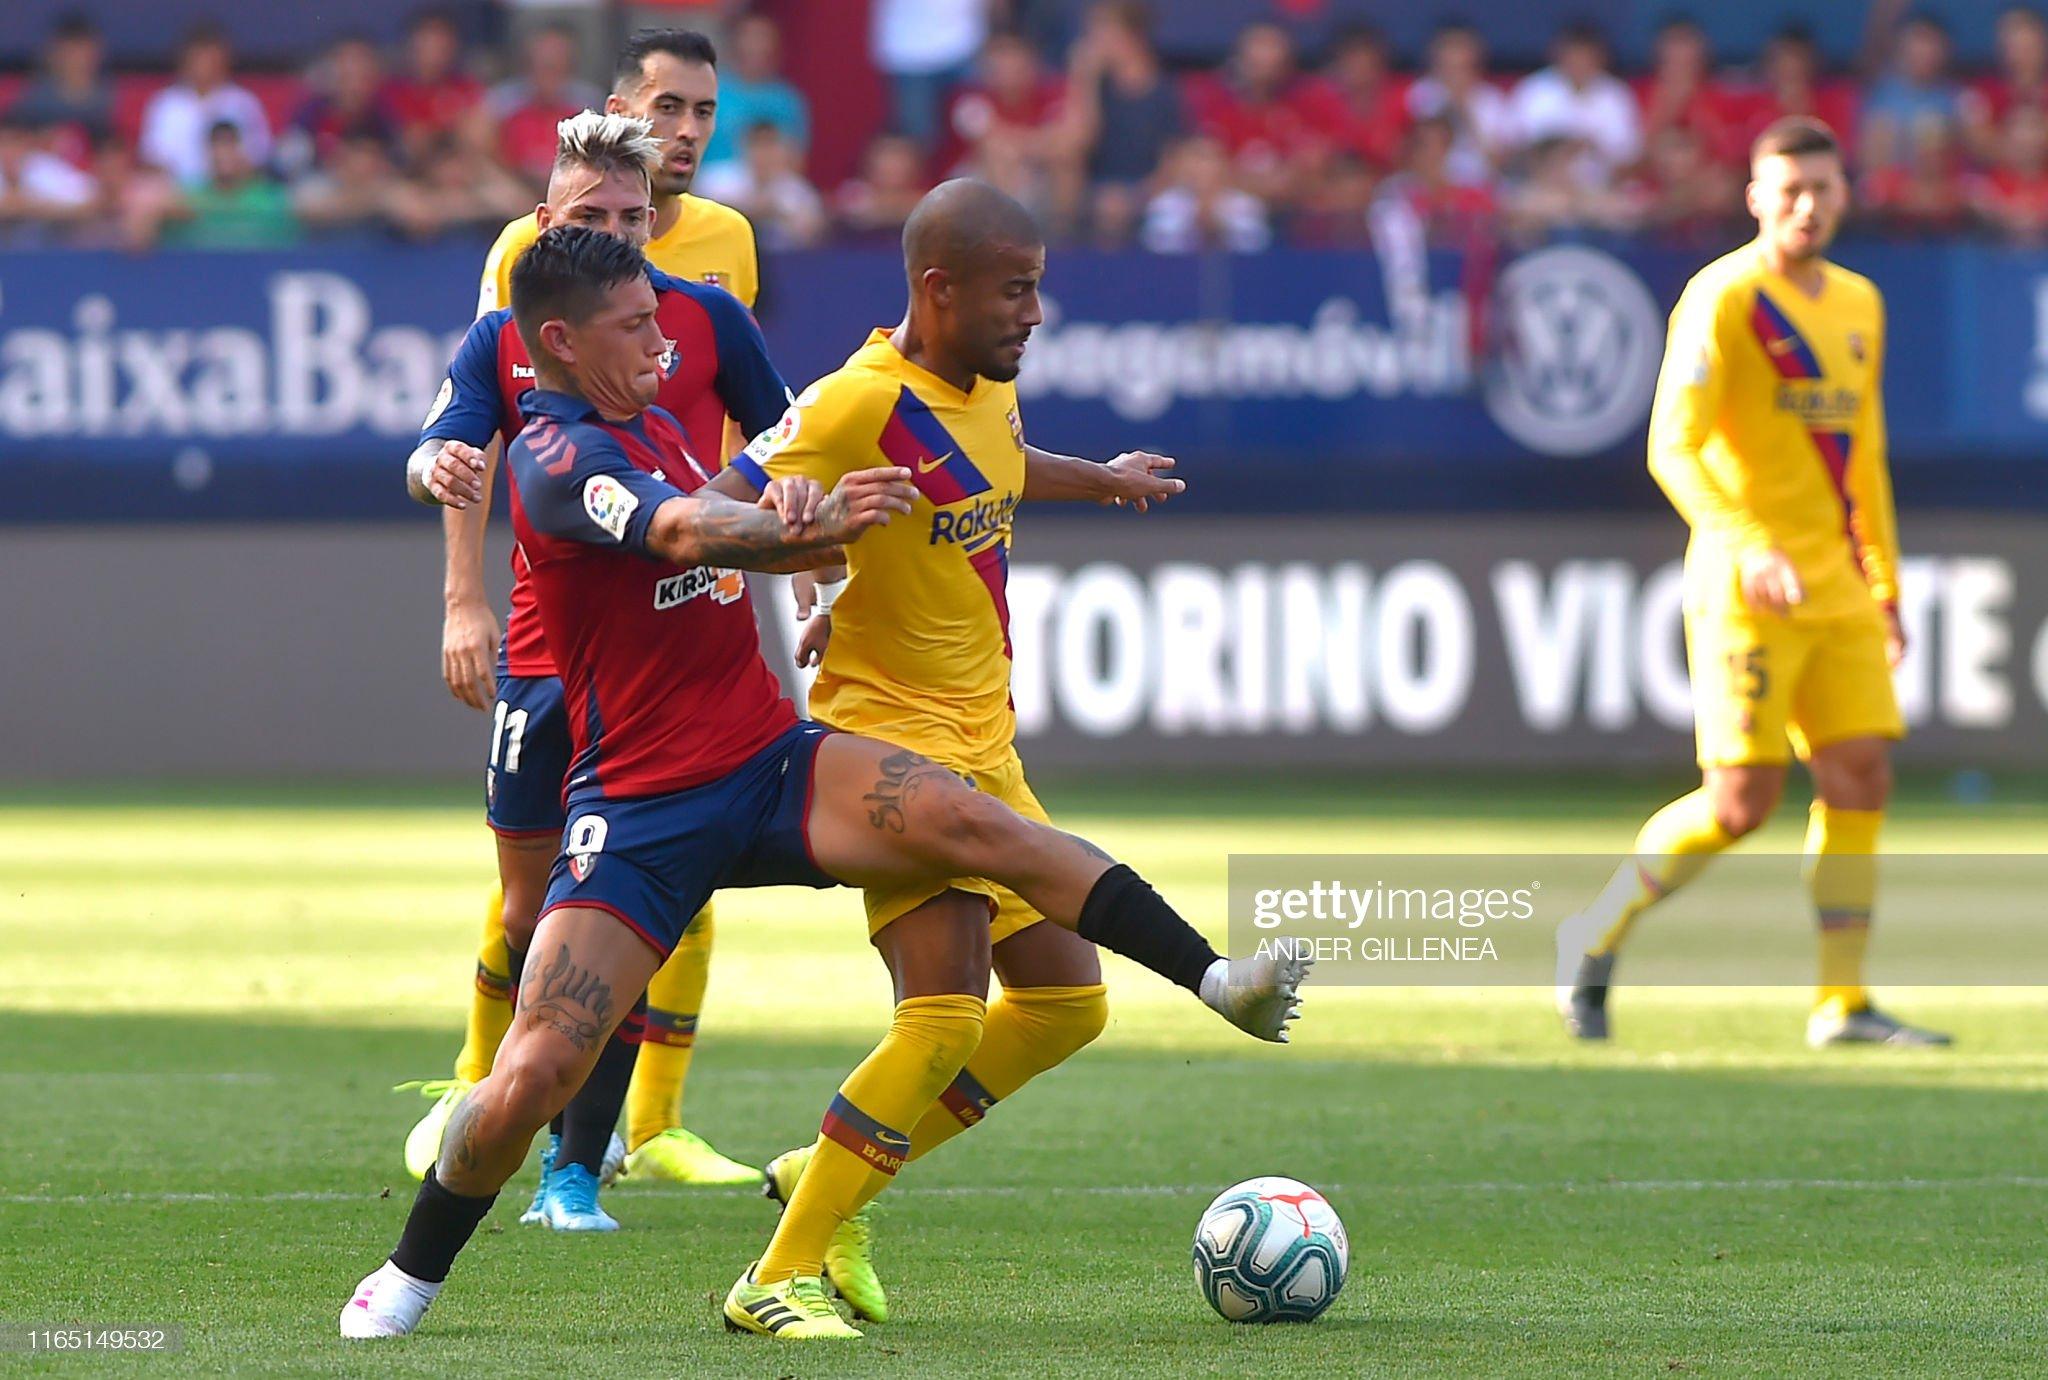 صور مباراة : أوساسونا - برشلونة 2-2 ( 31-08-2019 )  Barcelonas-brazilian-midfielder-rafinha-vies-with-osasunas-spanish-picture-id1165149532?s=2048x2048